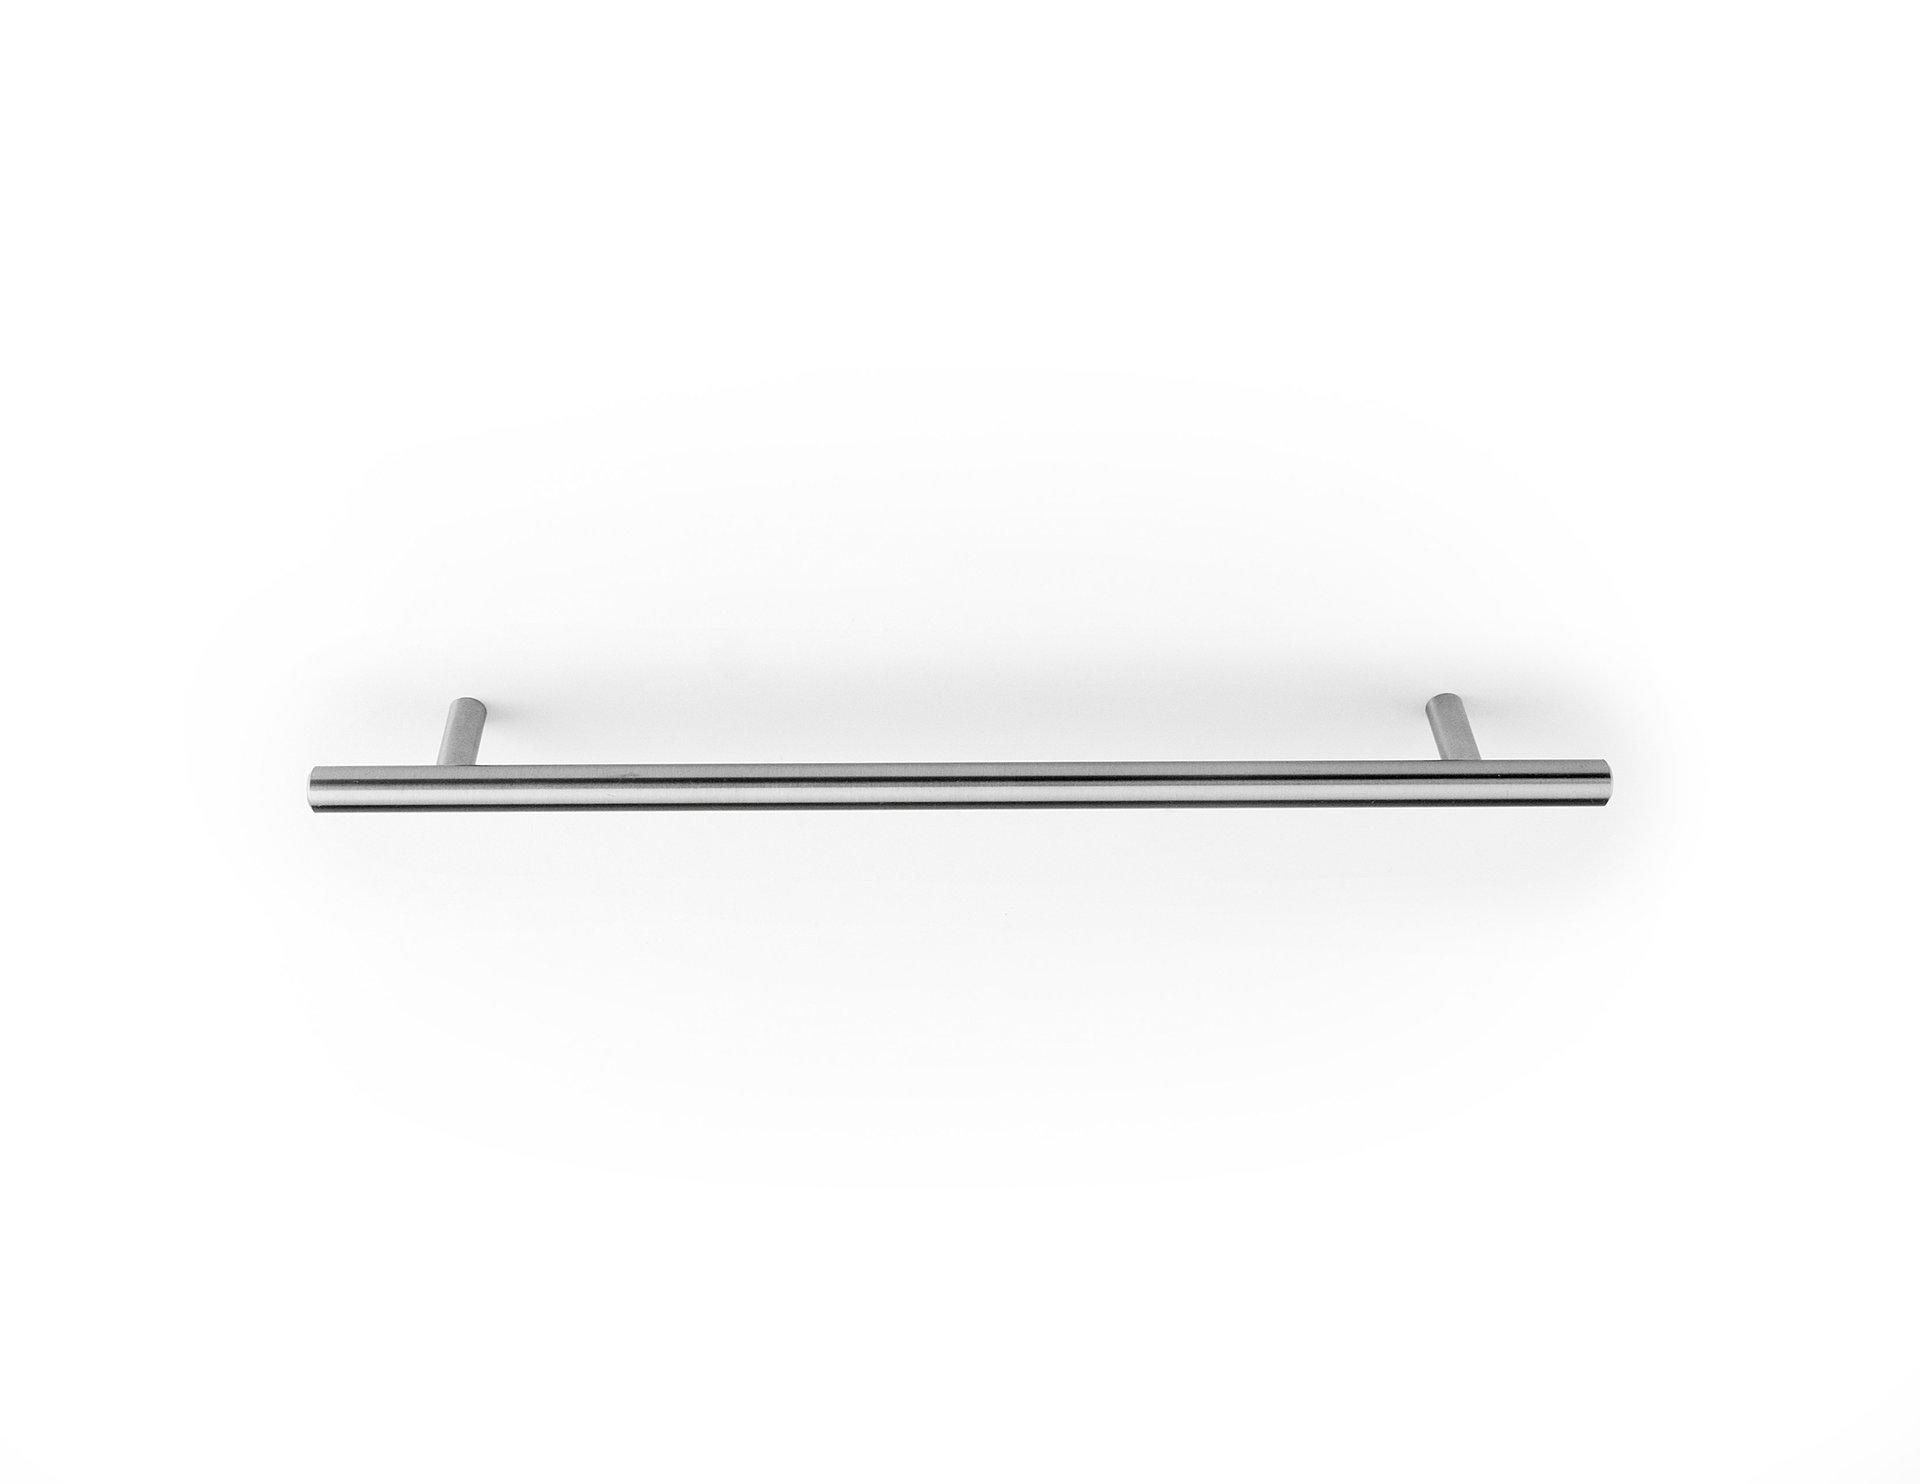 256mm Brushed Nickel Bar Handle